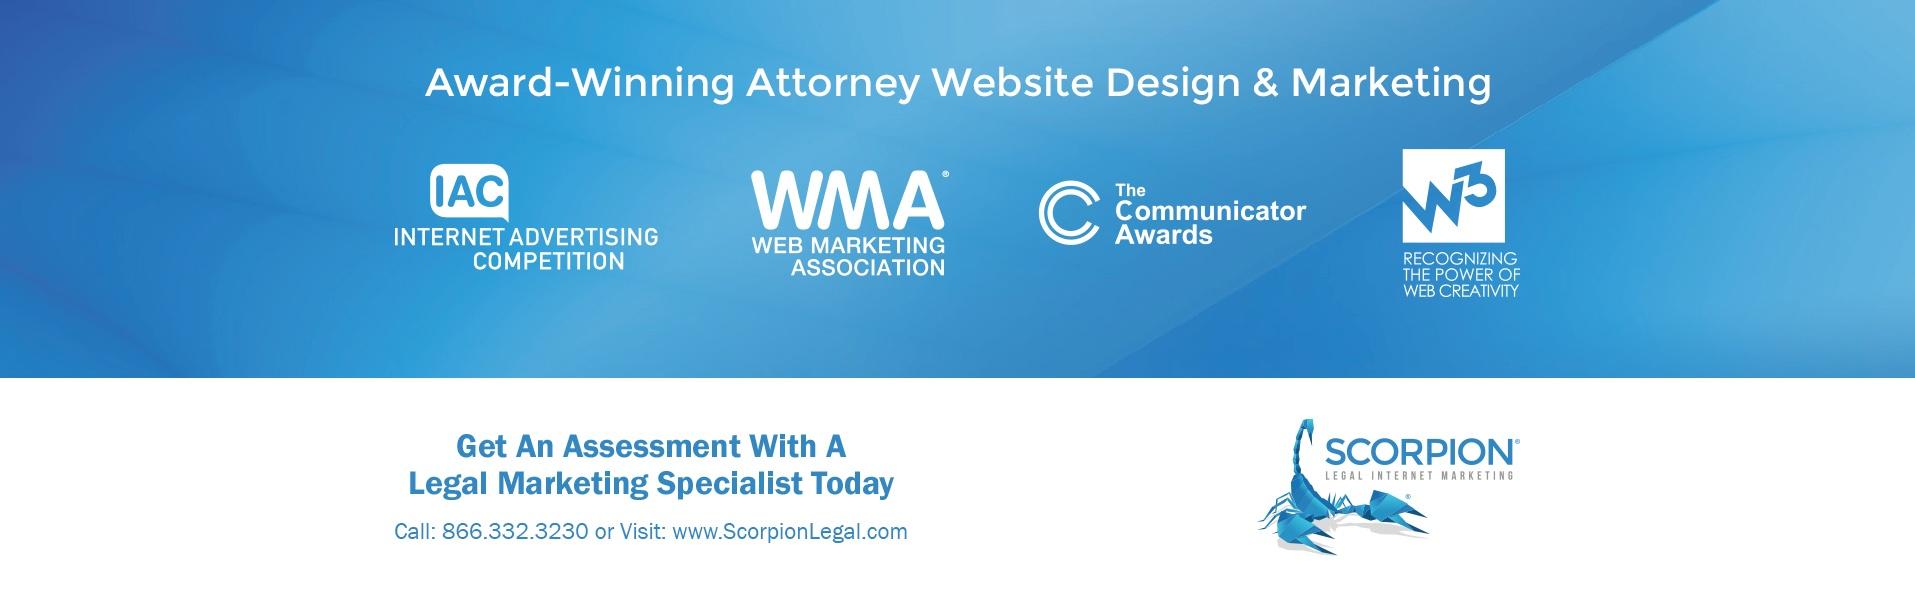 Scorpion Legal Offer